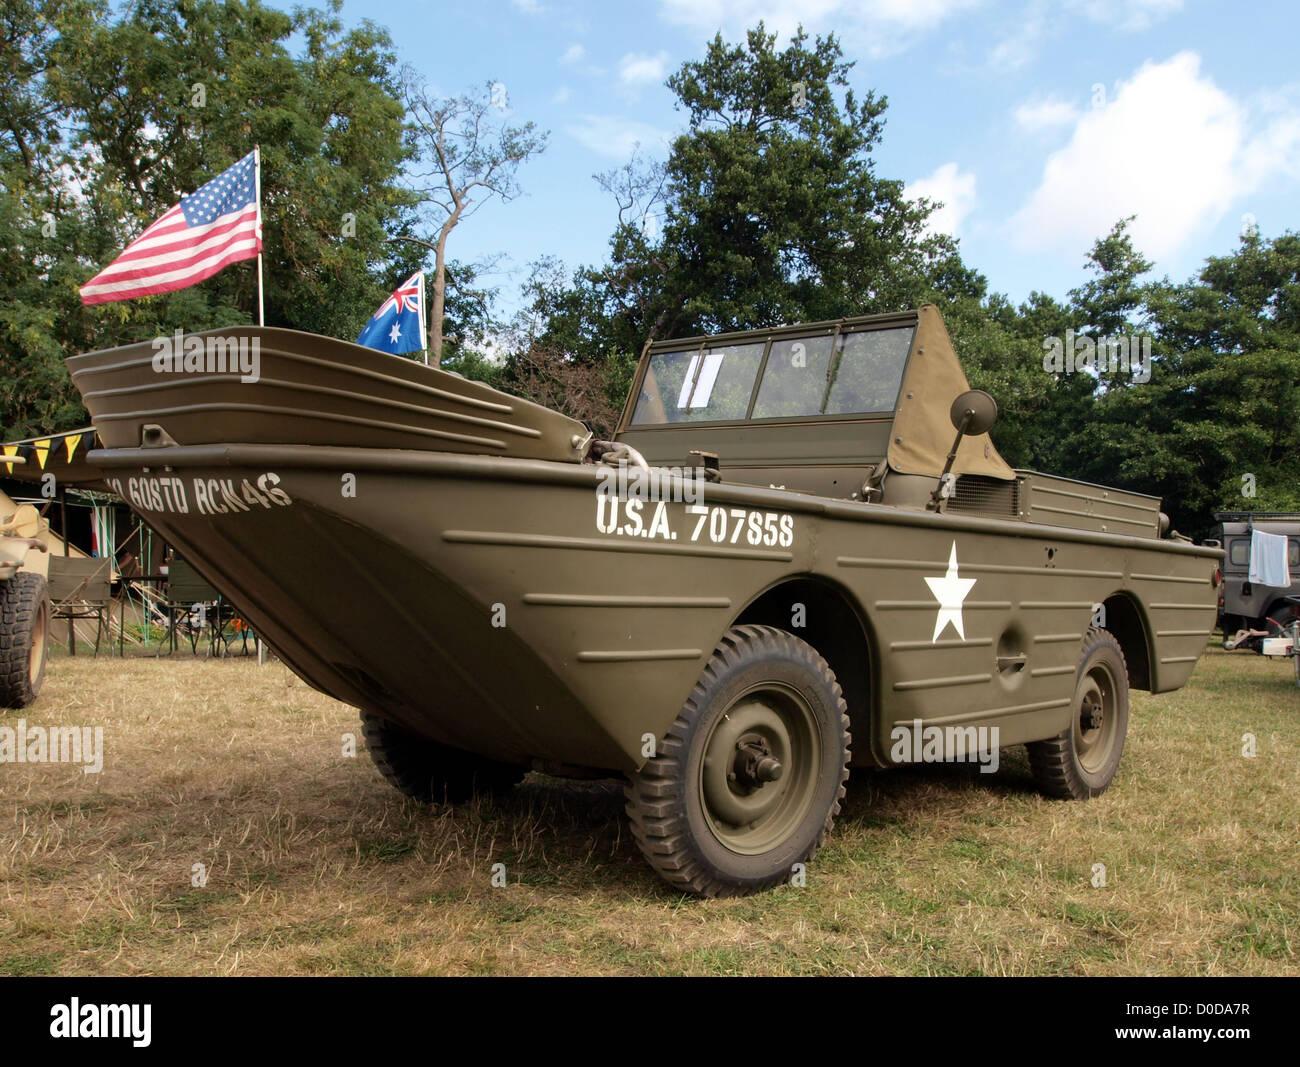 Ford GPA Amphibious Jeep Stock Photo: 51924539 - Alamy